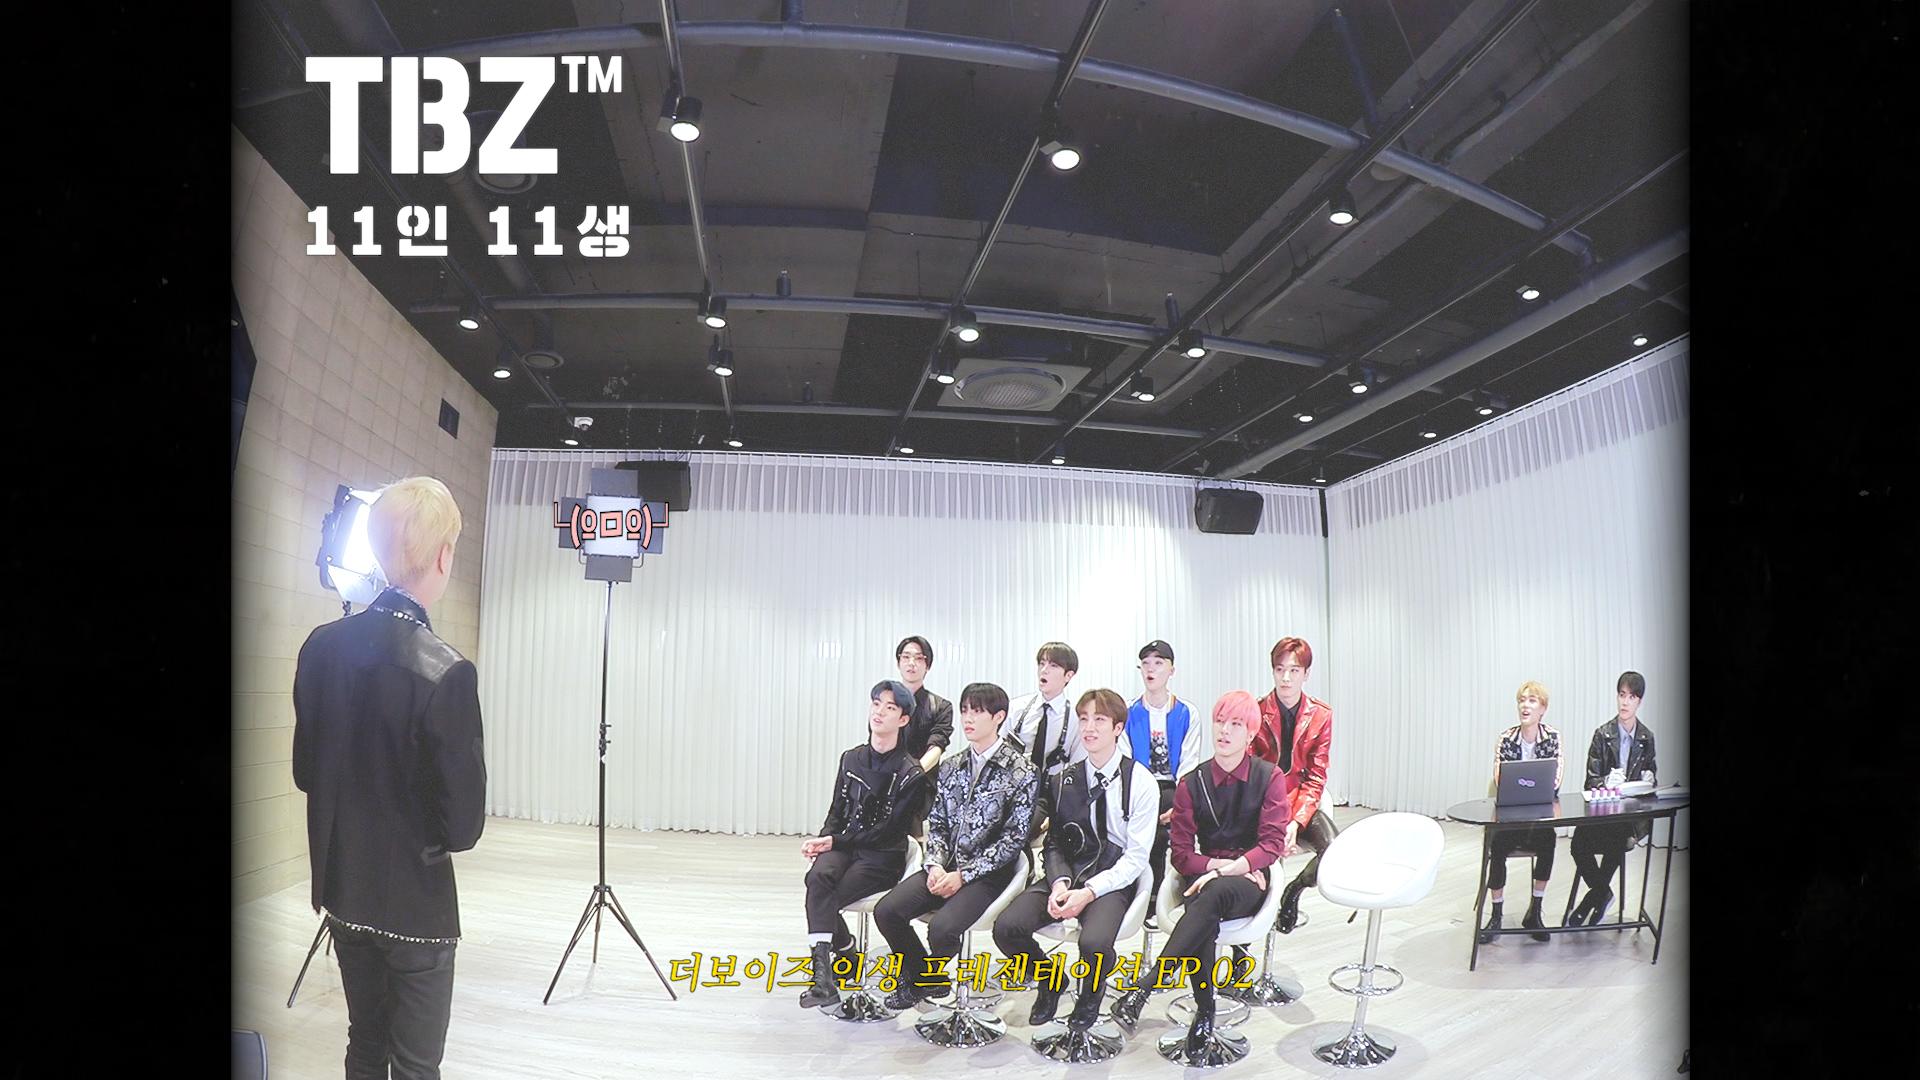 THE BOYZ(더보이즈) 11人11生 프레젠테이션 EP.02